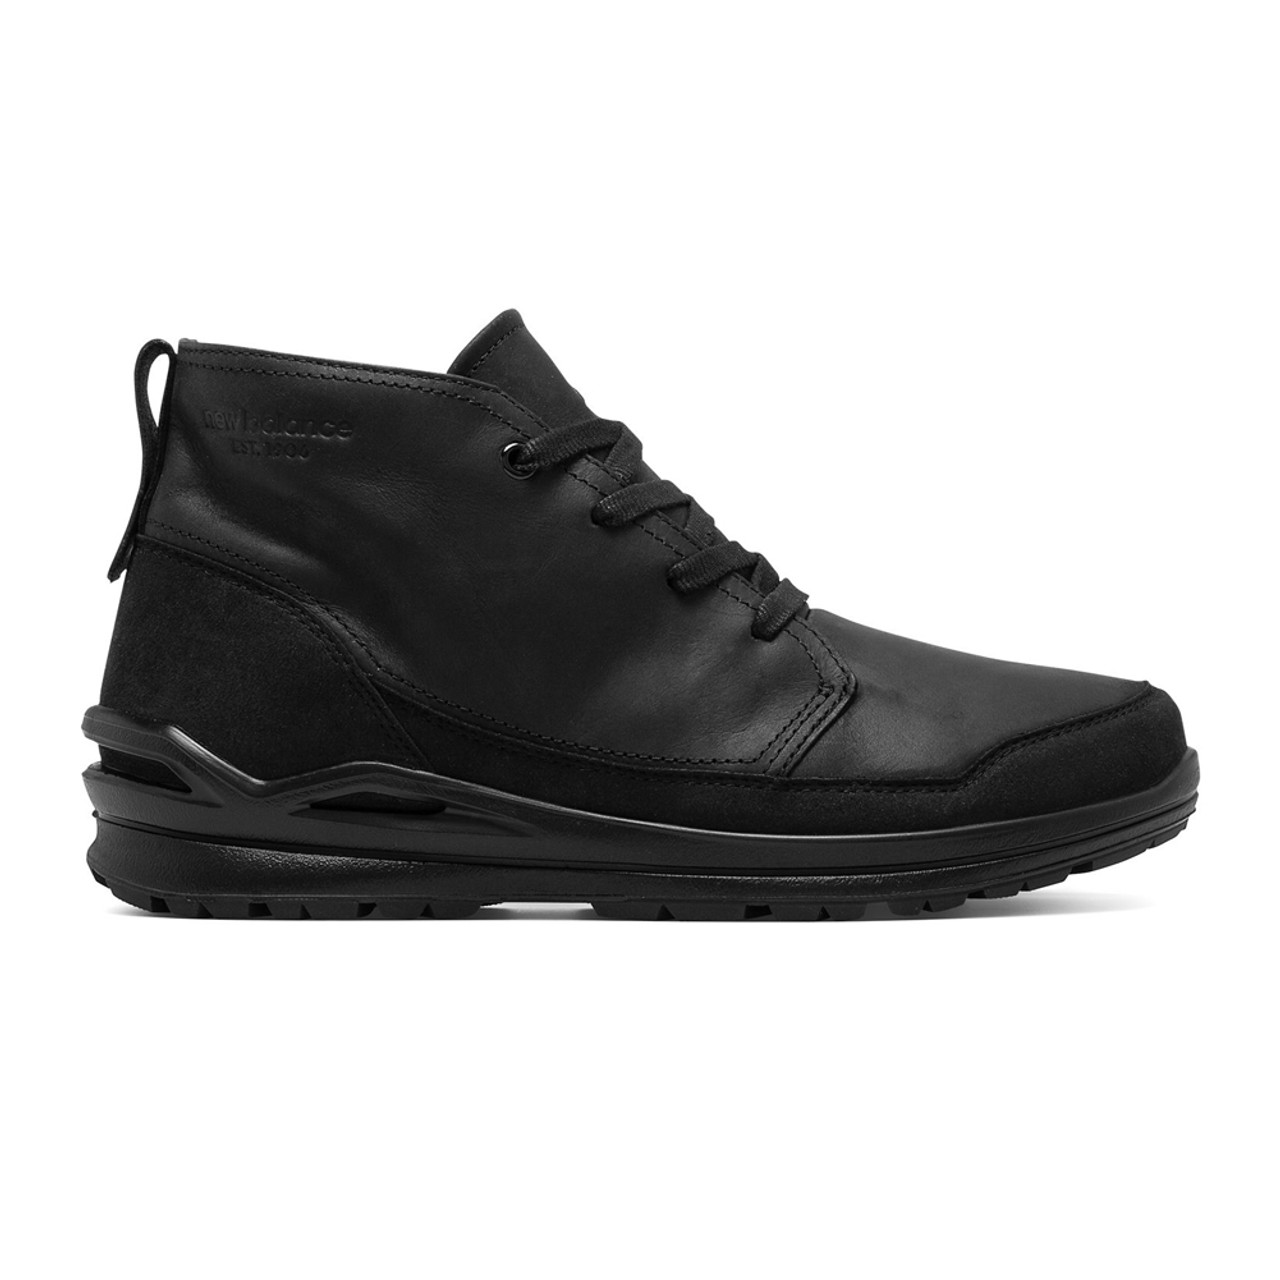 4e38c6069ded6 New Balance Men's BM3020BK Chukka Boot Black - Shop now @ Shoolu.com